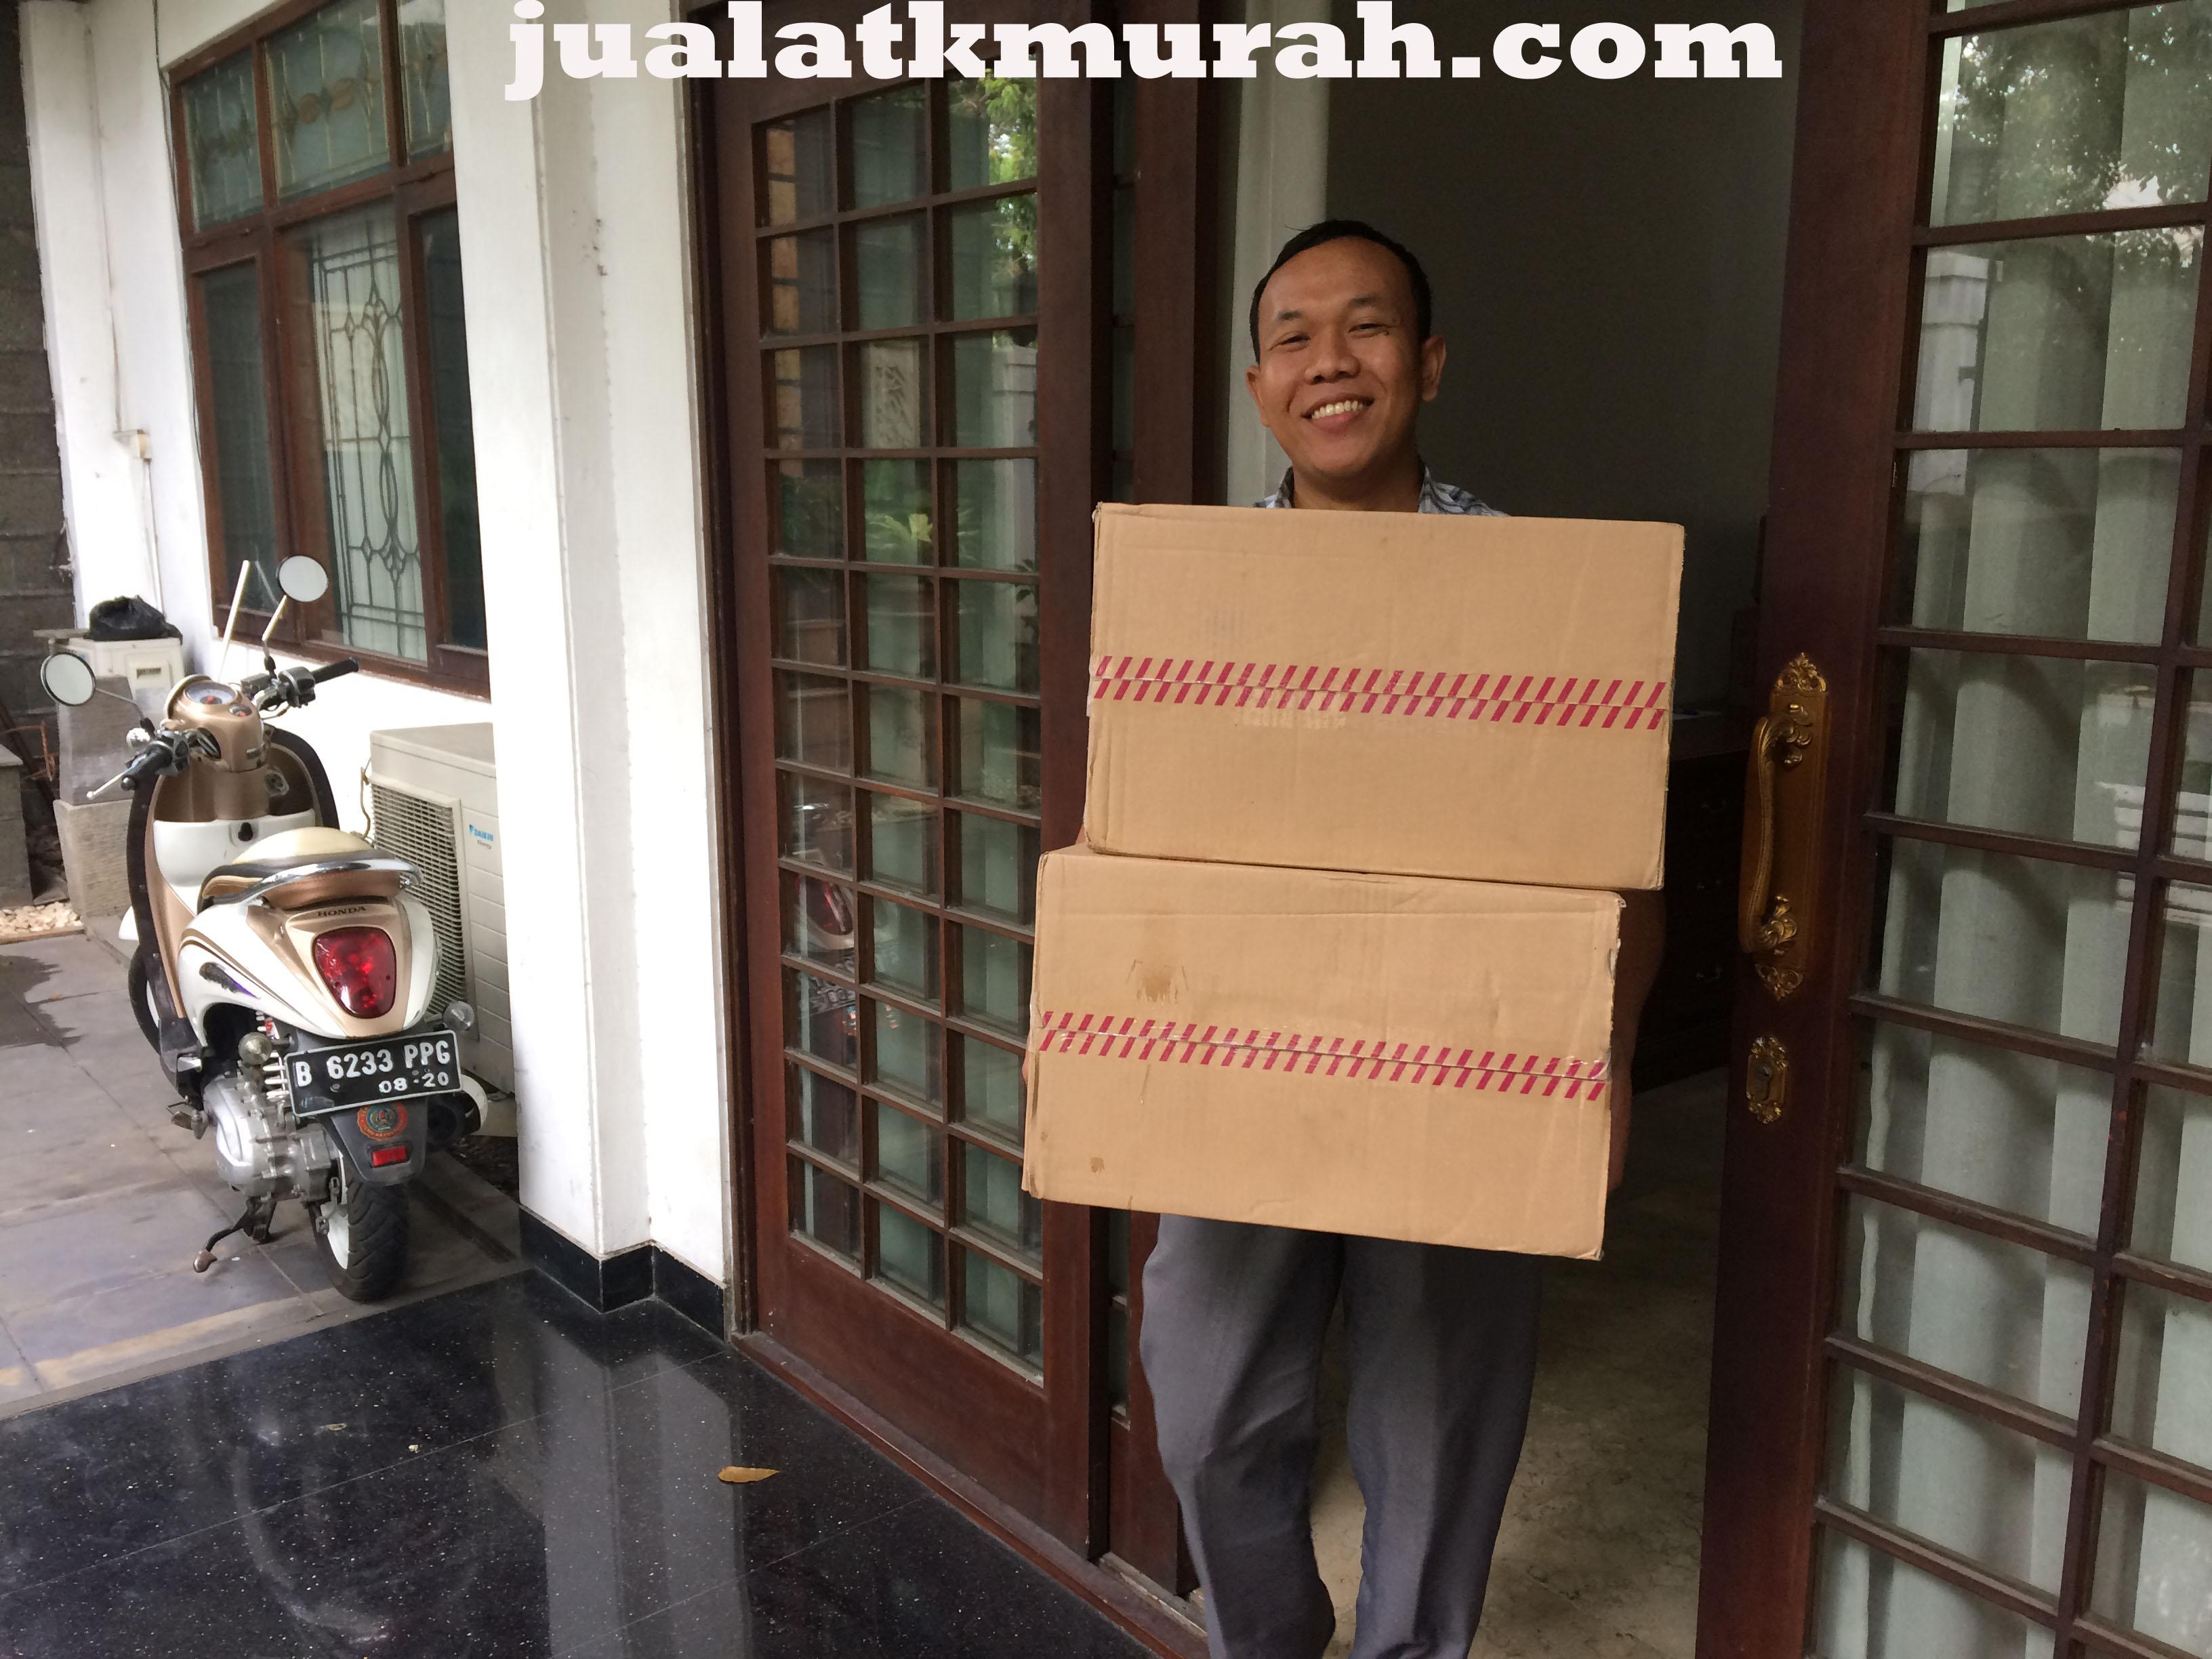 Jual ATK Murah Casablanca Jakarta Timur